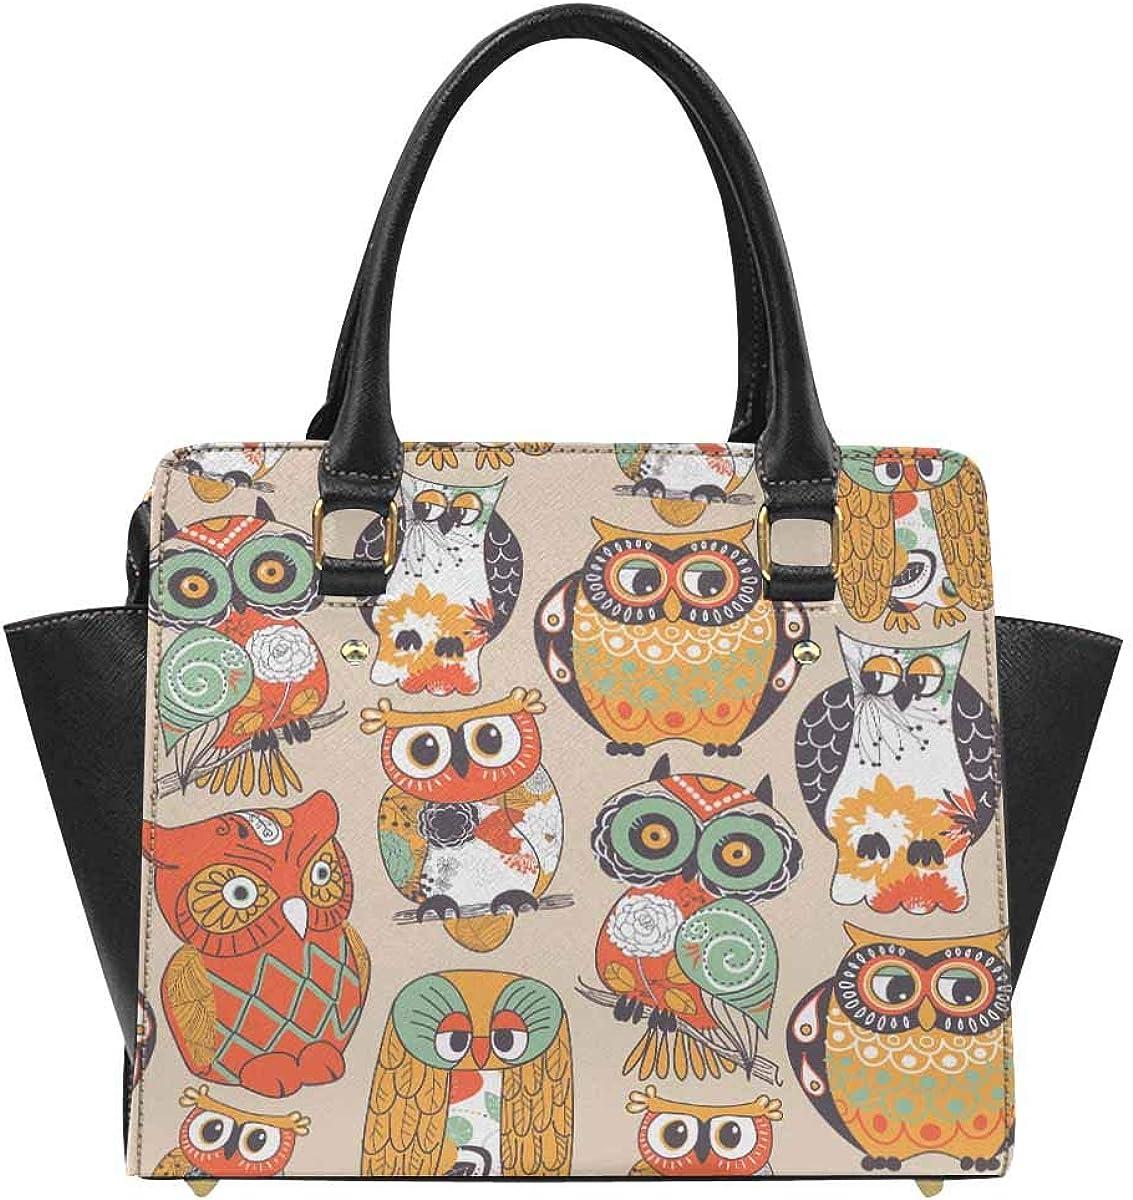 INTERESTPRINT Owl Pattern Women Top Handle Satchel Handbags Tote Purse